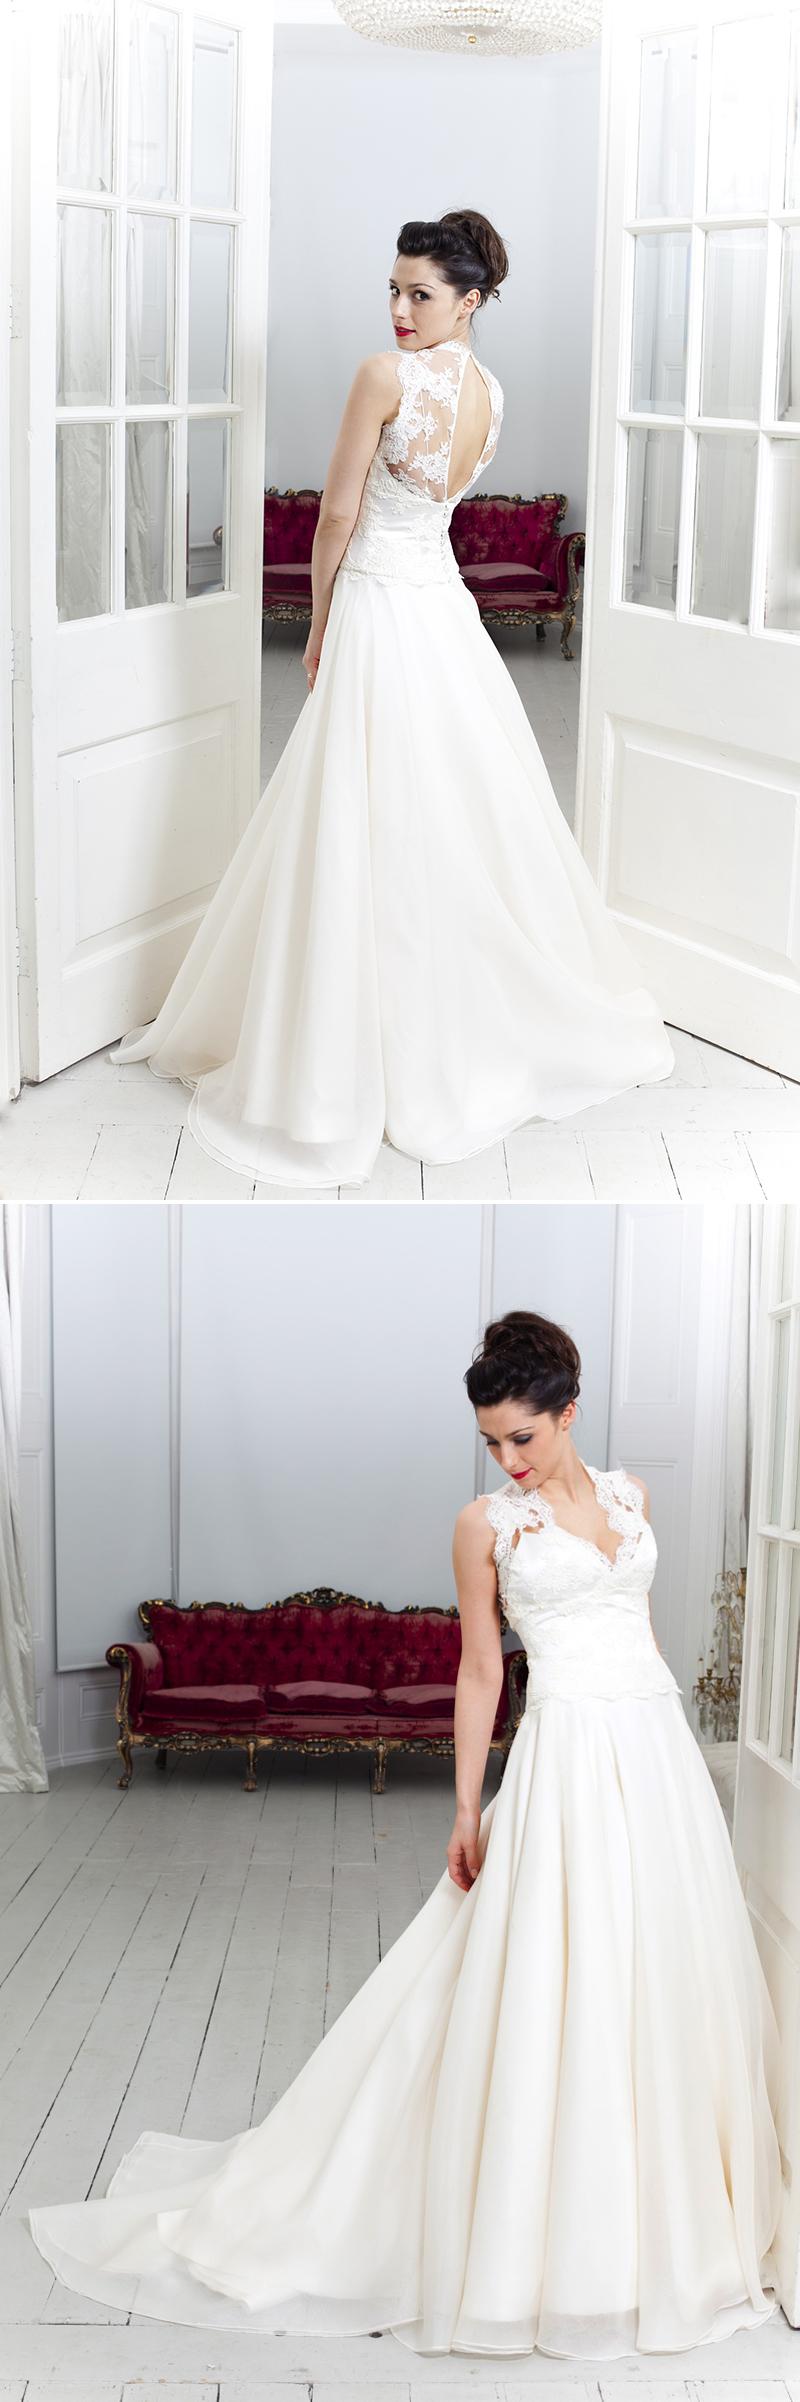 Coco Wedding Venues - Emma Hunt Luxury Bridal Sample Sale at Fulham Palace on 12th january 2014.